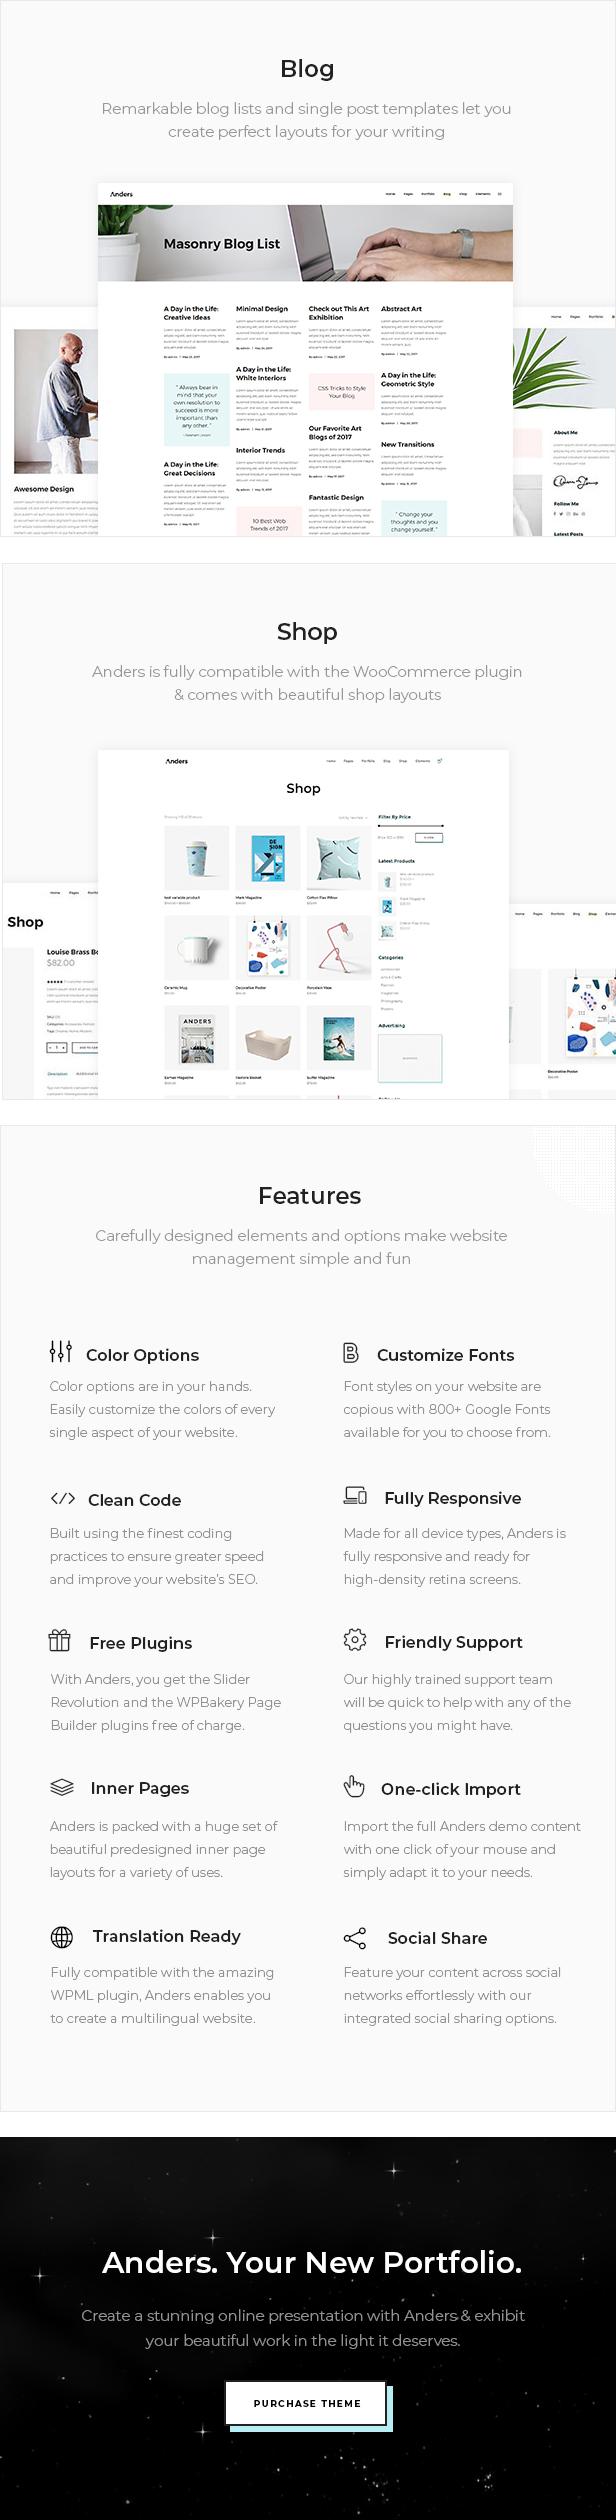 Anders - Design Portfolio Theme - 4